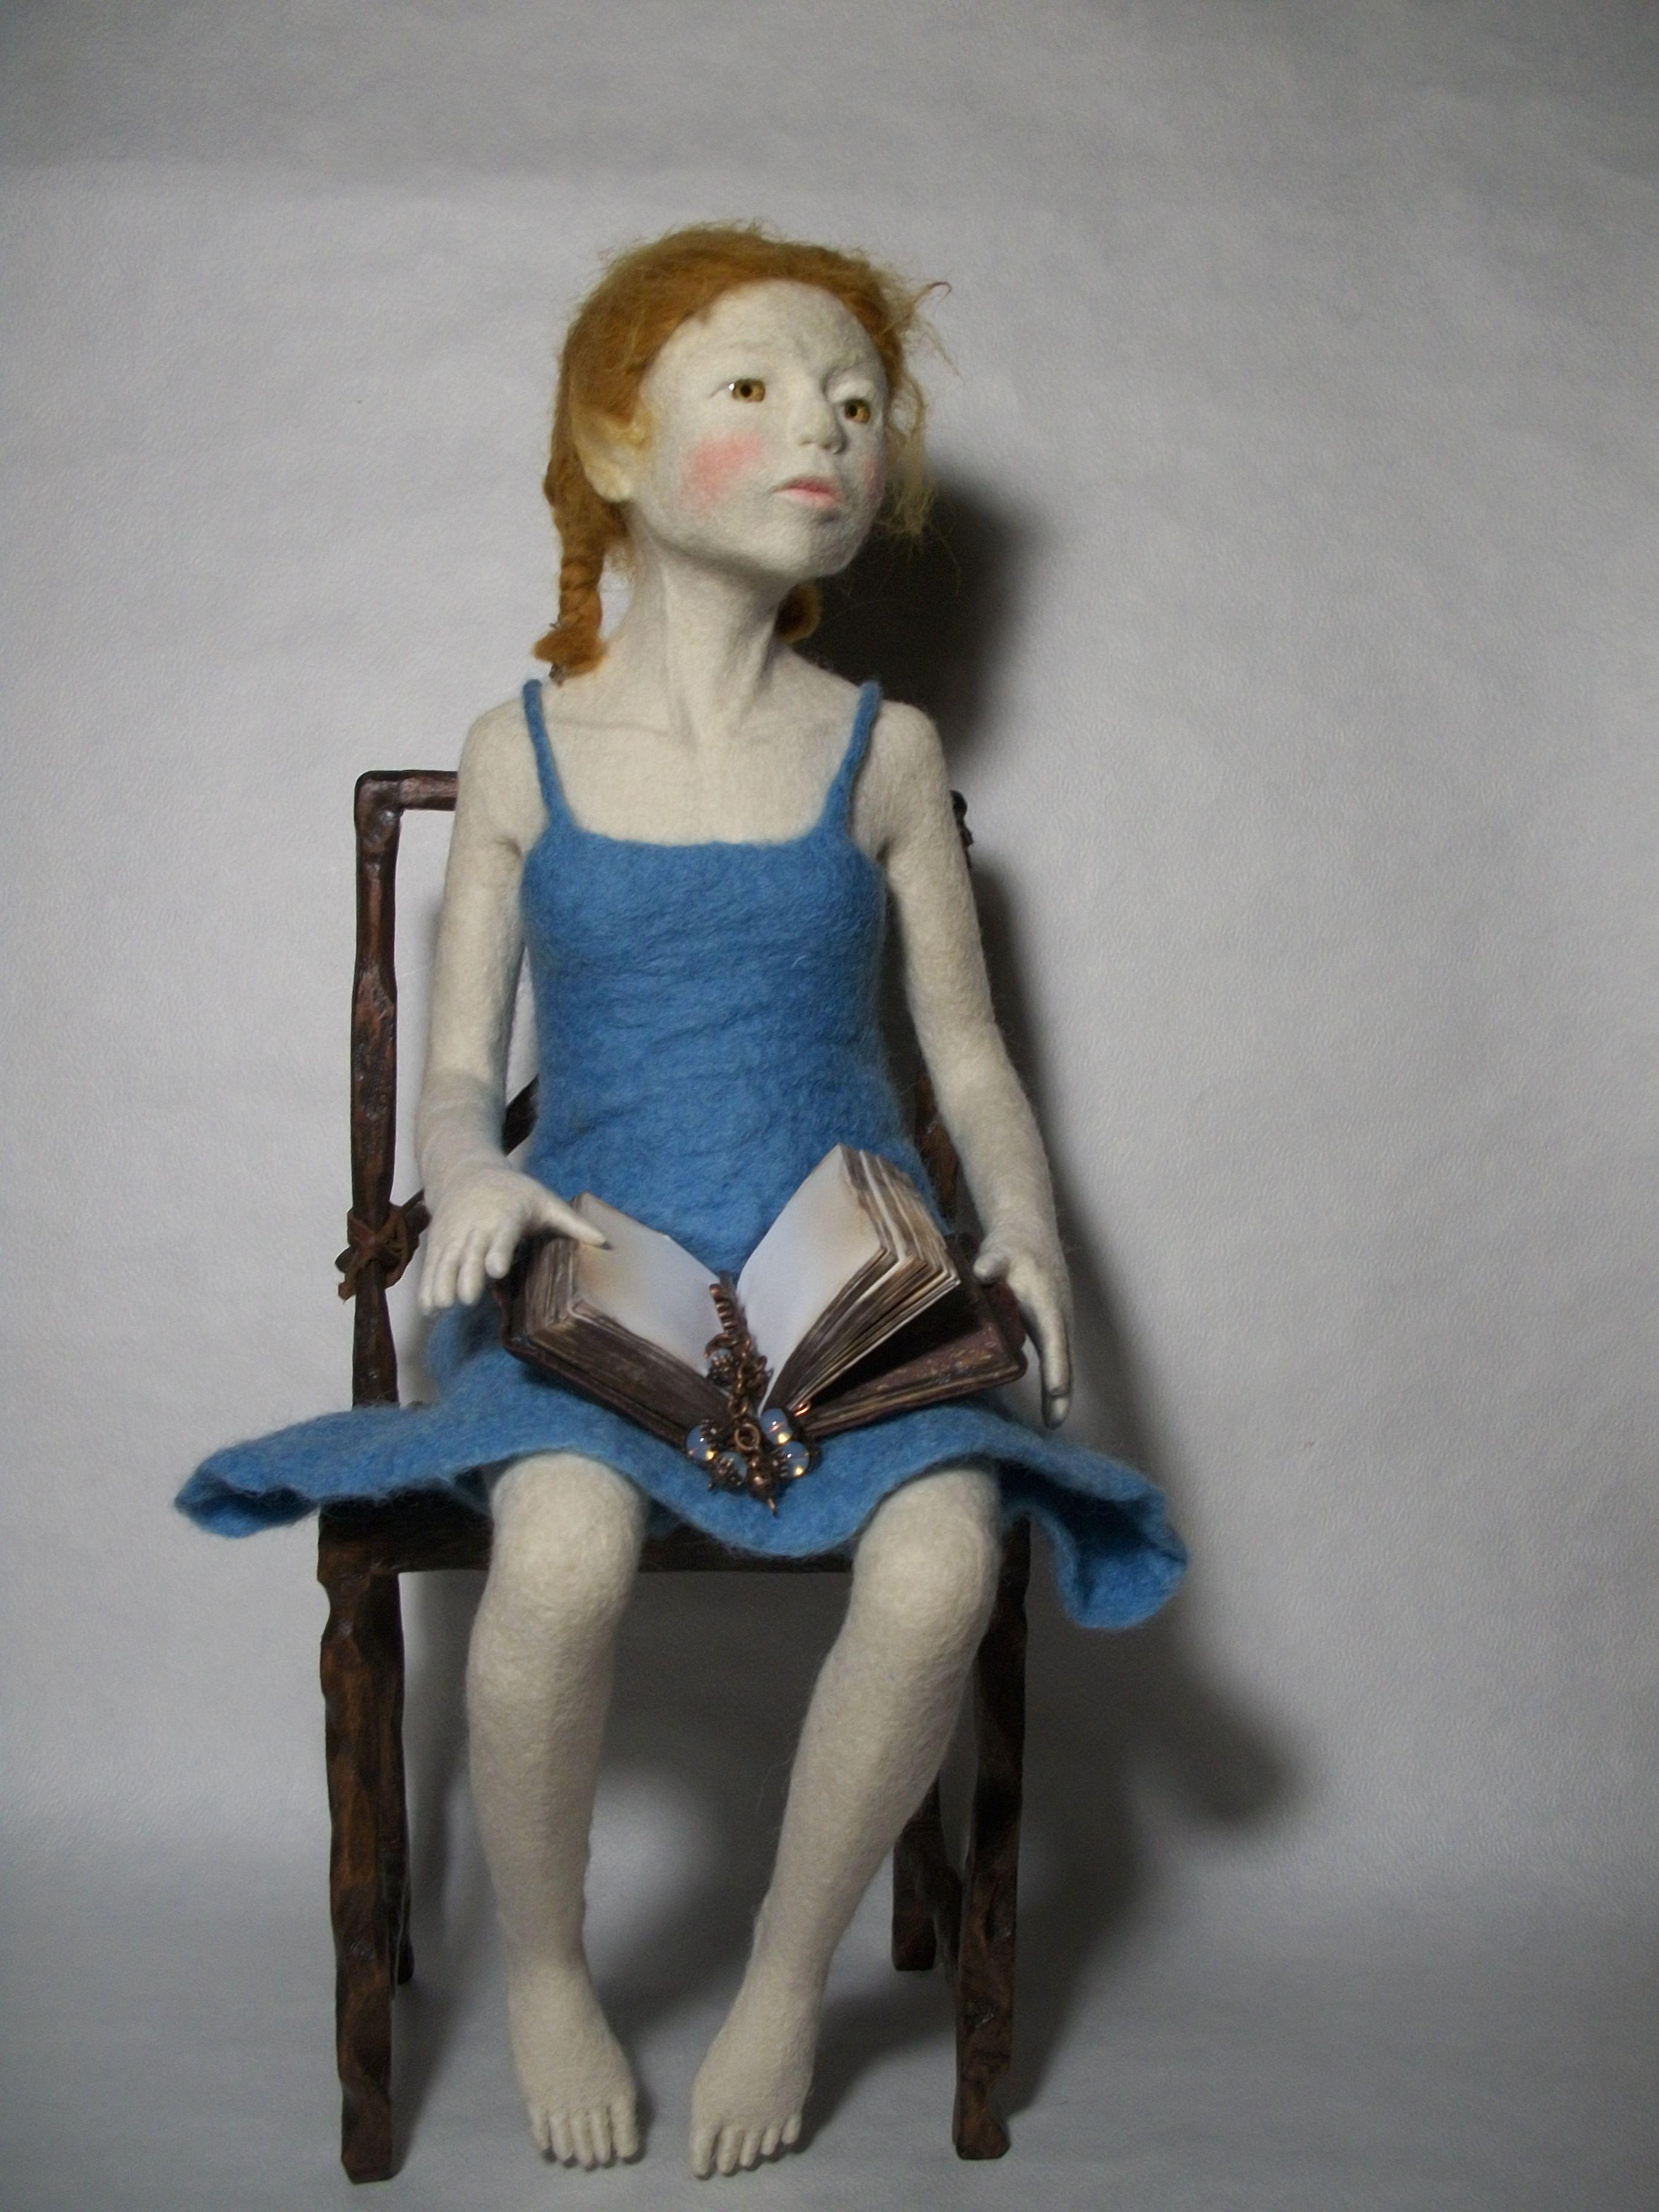 Felt Sculptur by Petrovich Elena. Ukraine